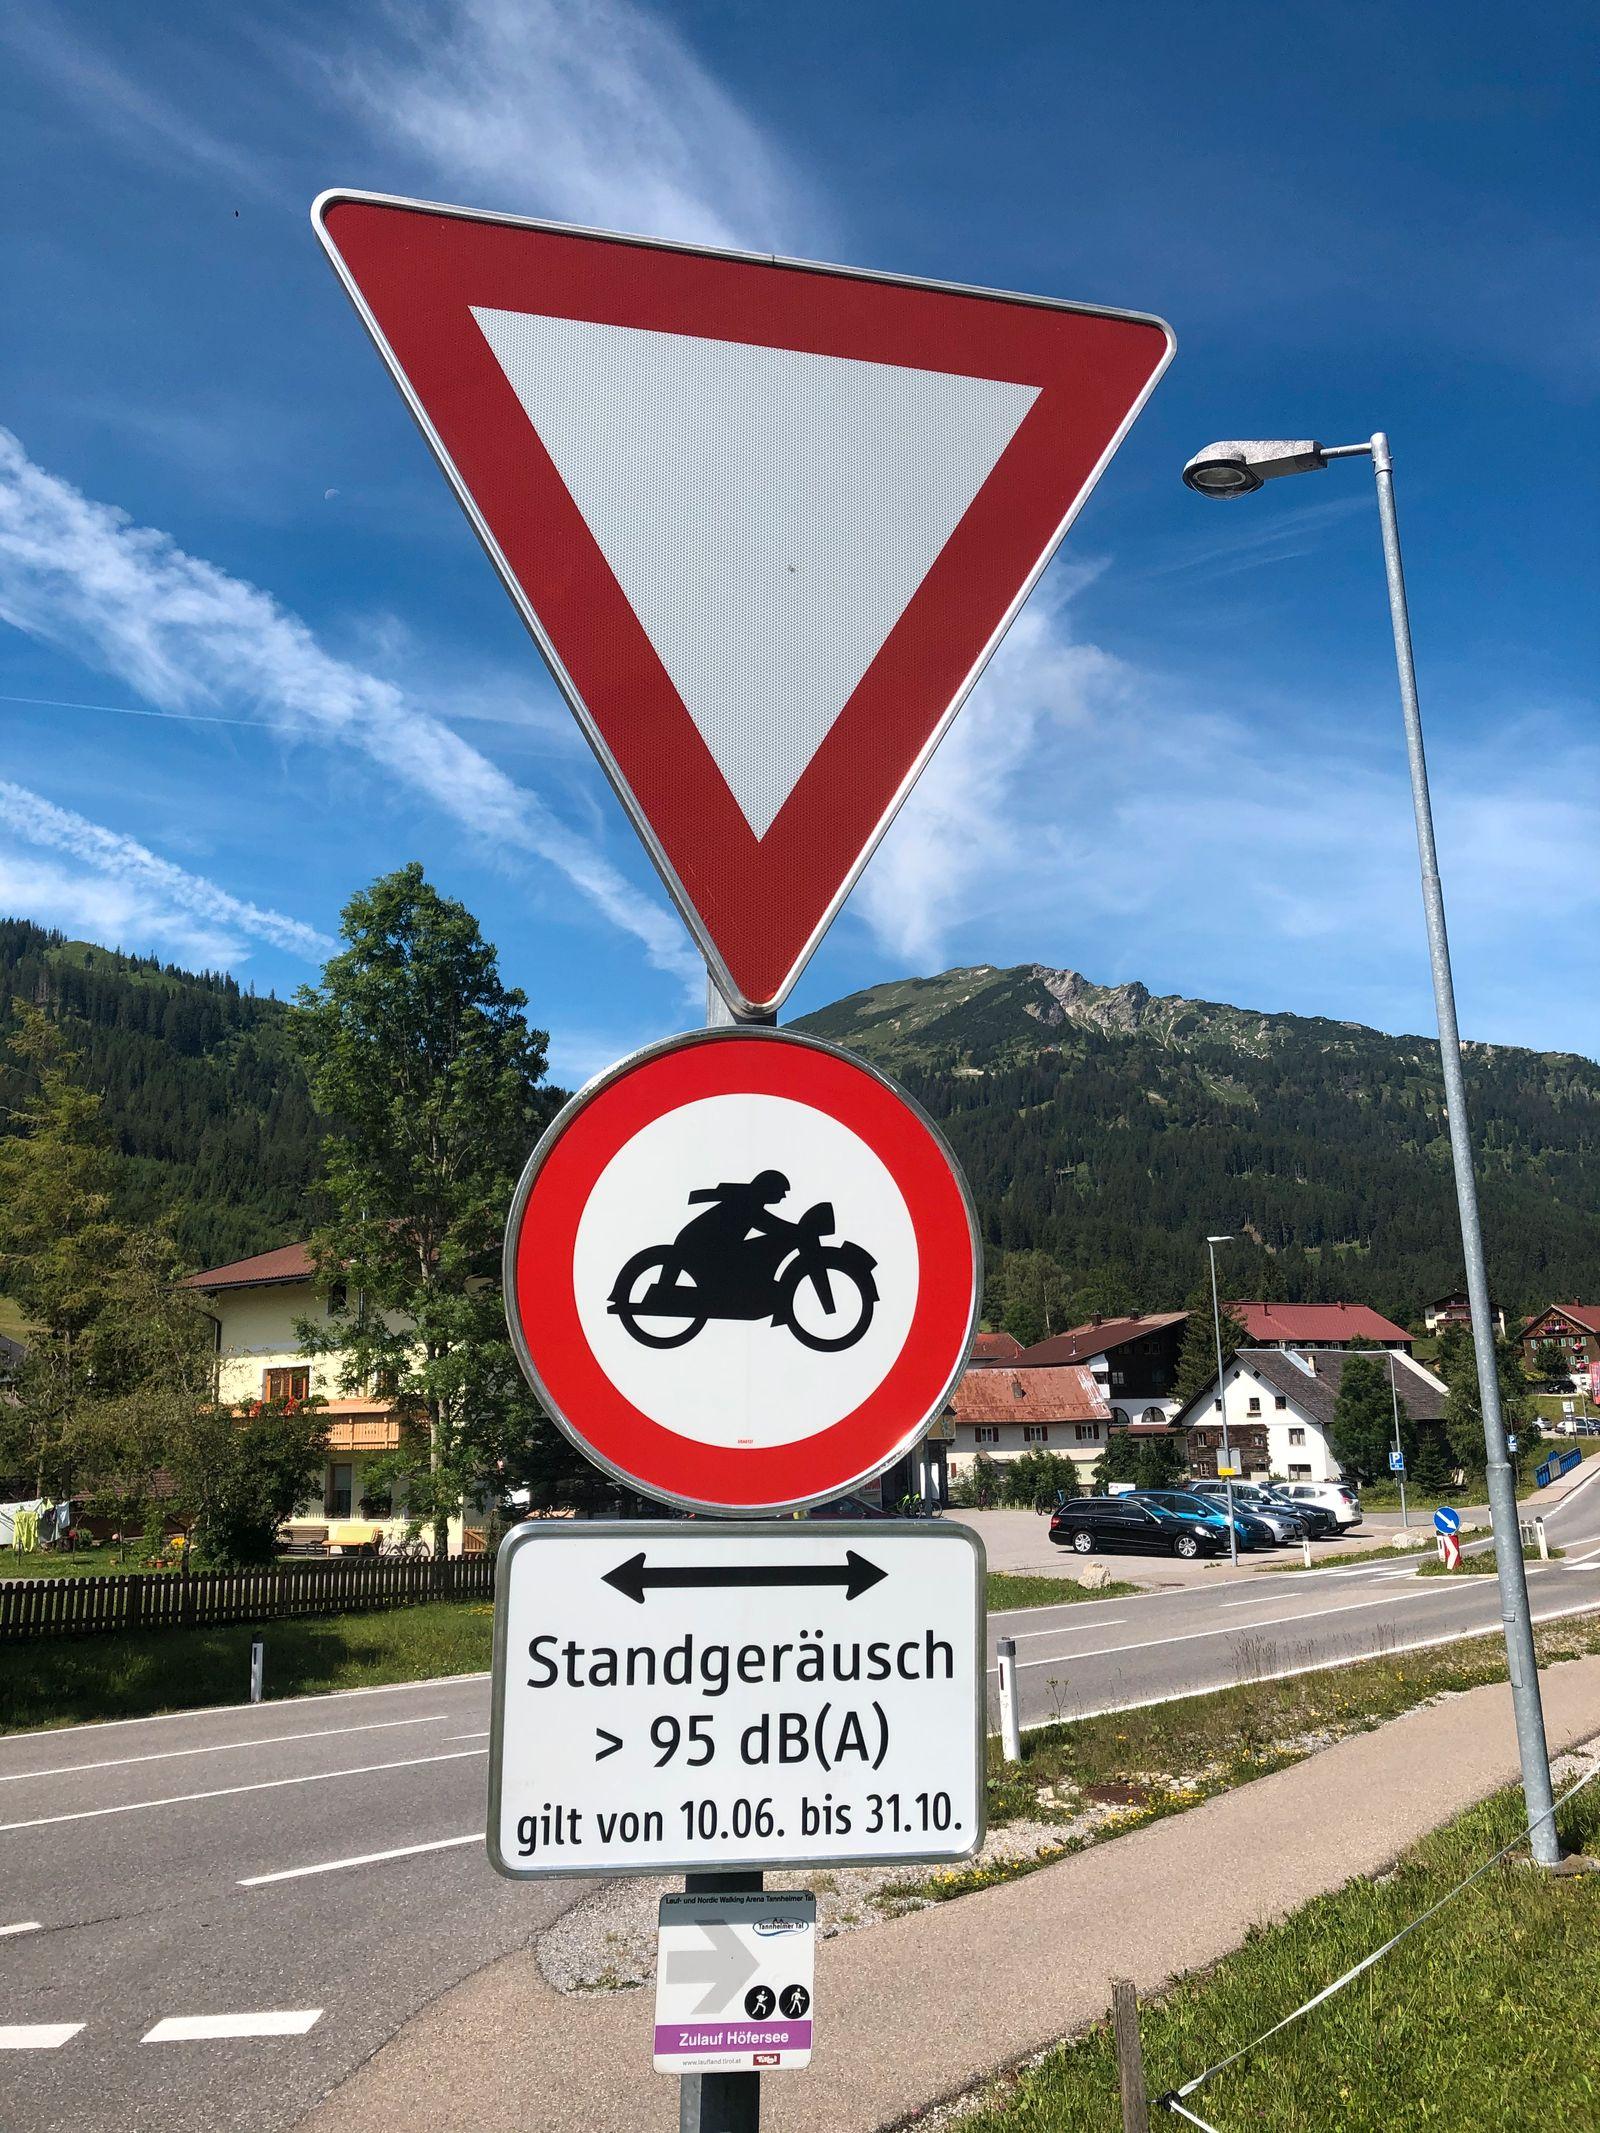 Motorradlärm, Verbot, Schild, Tannheimer Tal